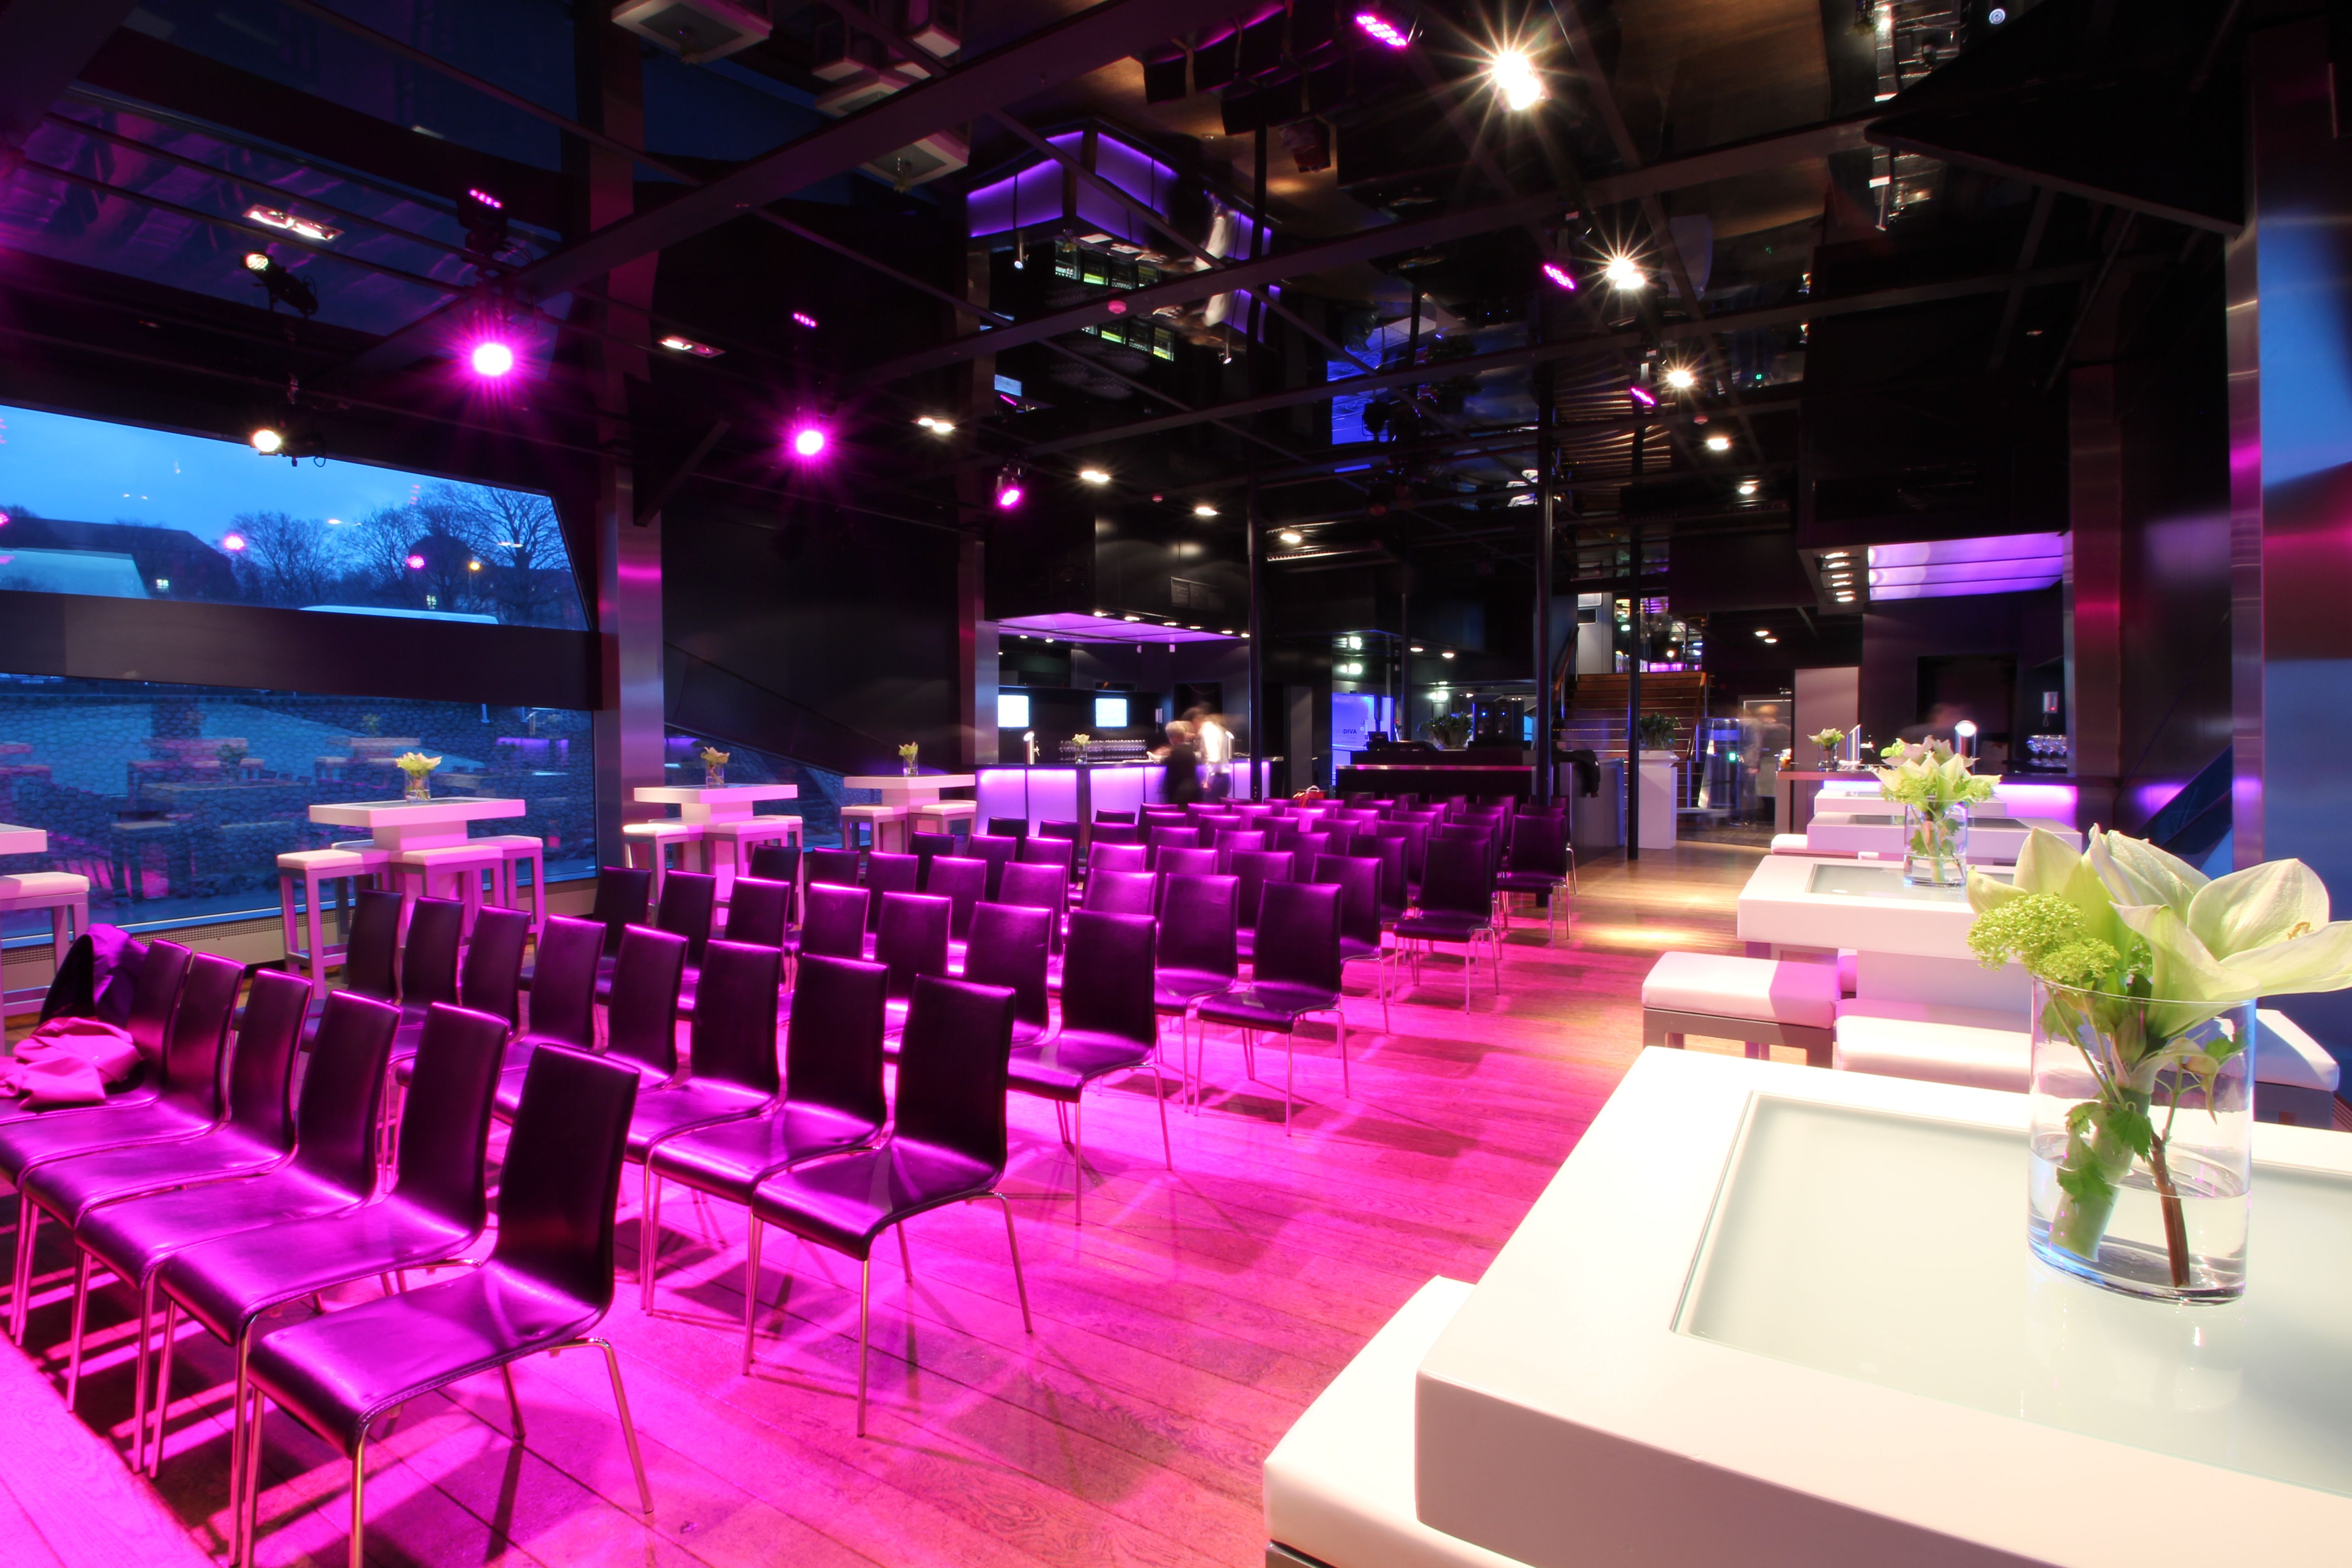 Congres Location Veranstaltungsraum Eventlocation Partyraum